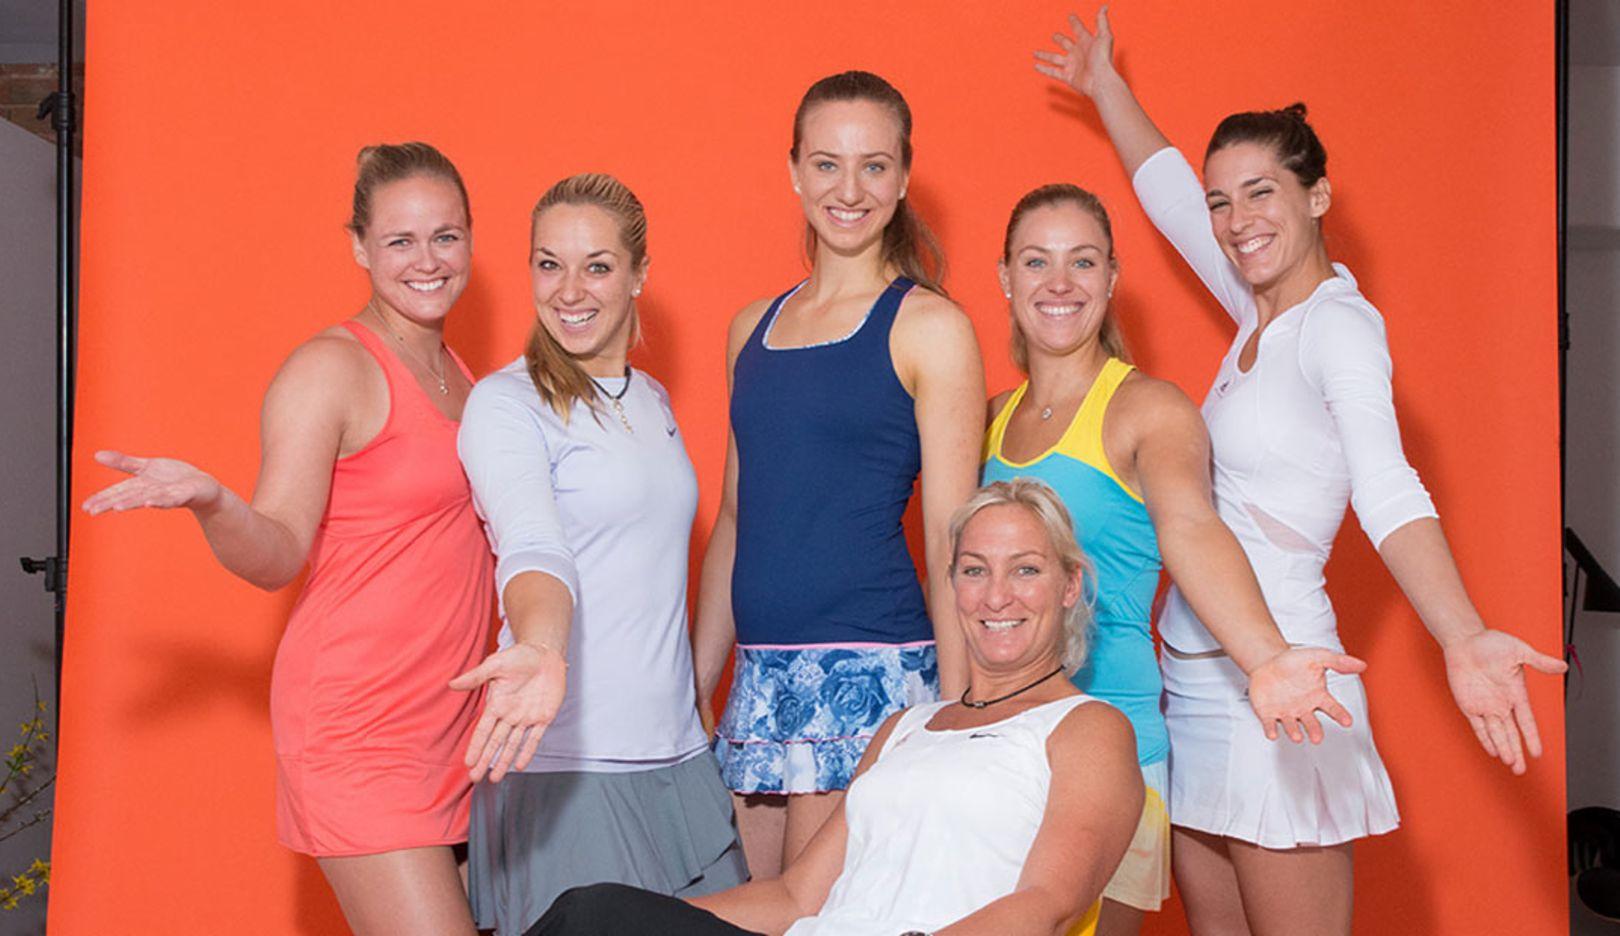 Anna-Lena Grönefeld, Sabine Lisicki, Mona Barthel, Barbara Rittner, Angelique Kerber, Andrea Petkovic, l.-r., Porsche Team Deutschland, 2014, Porsche AG